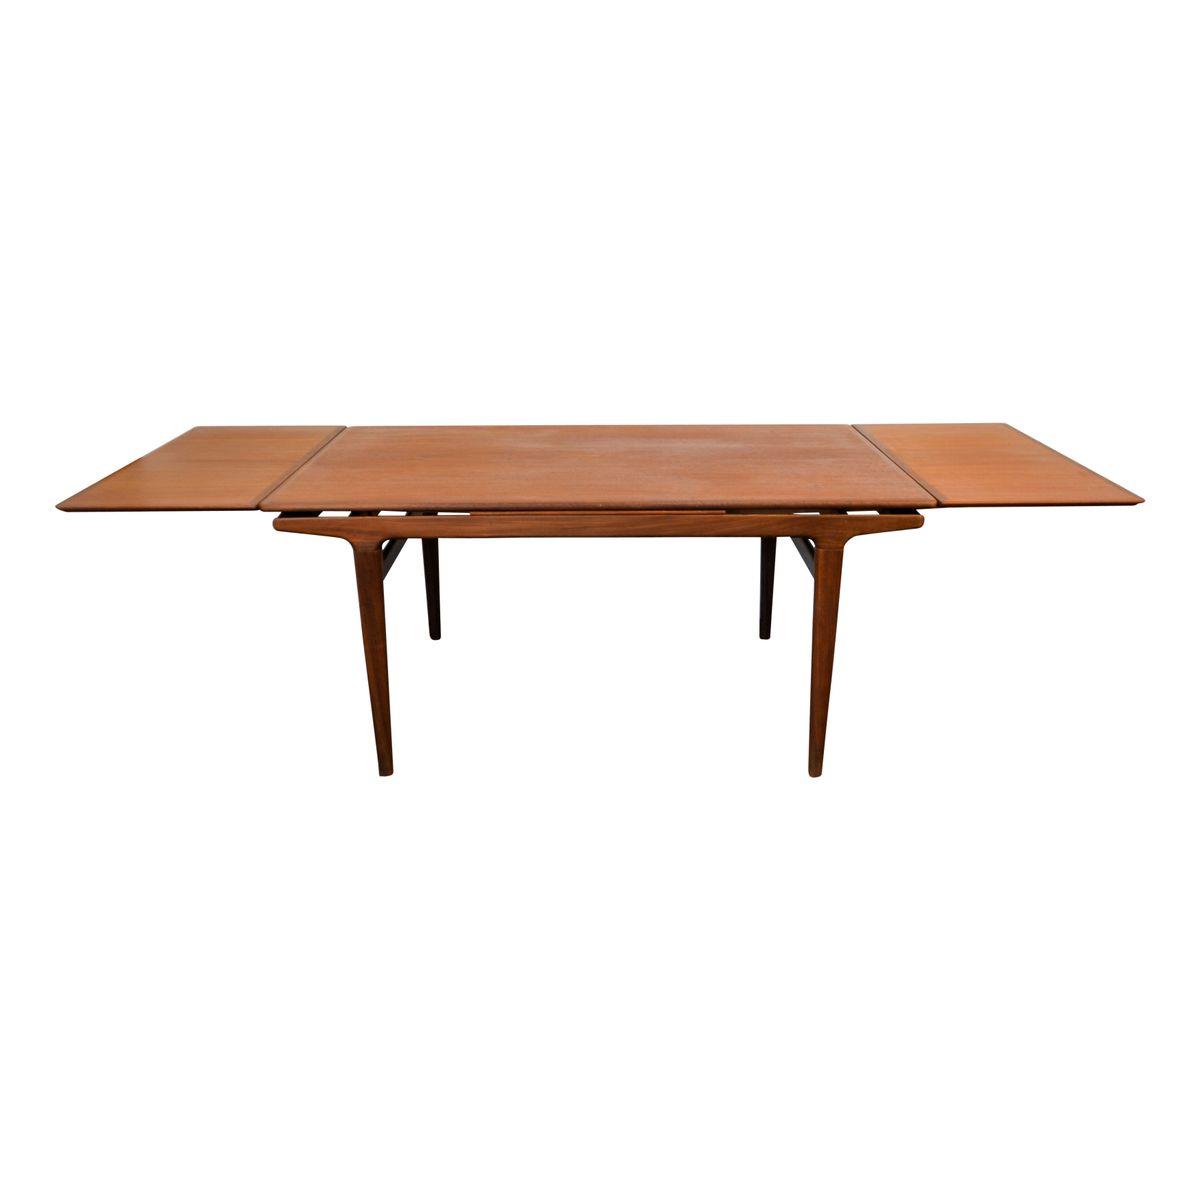 Vintage Teak Exendable Dining Table by Johannes Andersen  : vintage teak exendable dining table by johannes andersen for uldum mobelfabrik 5 from www.pamono.co.uk size 1200 x 1200 jpeg 25kB